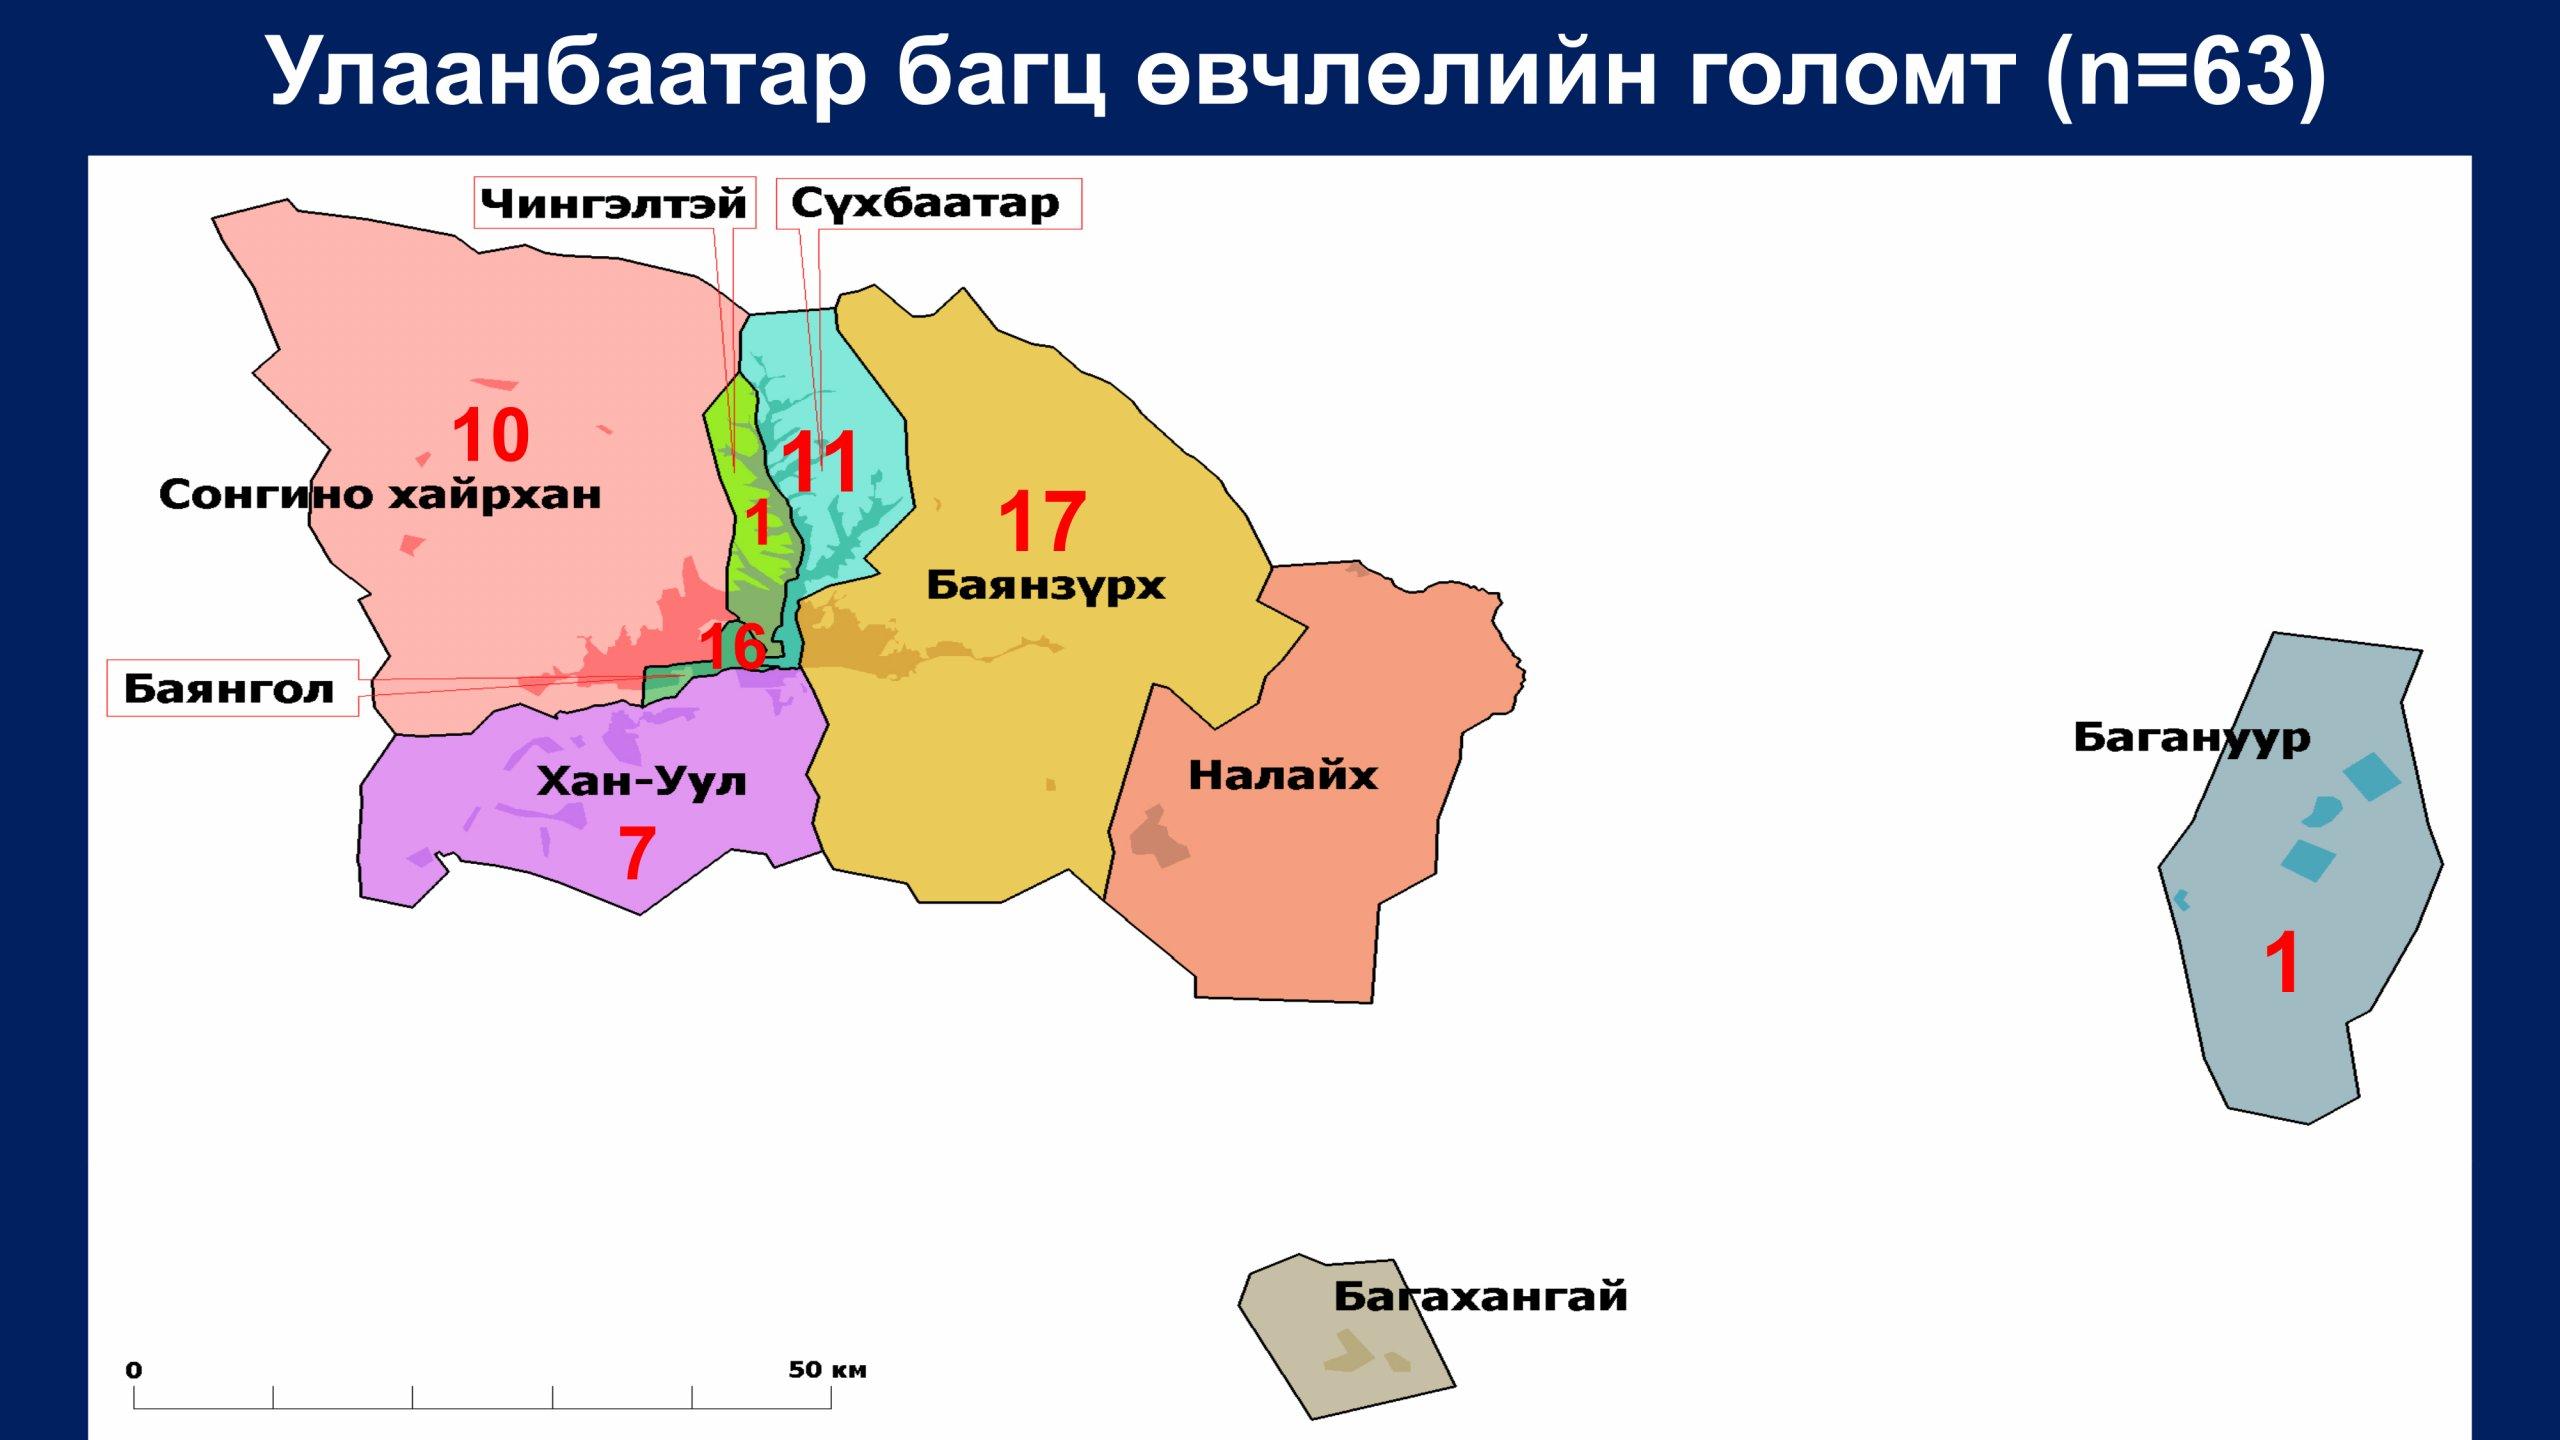 PPT-2020.11.26-5